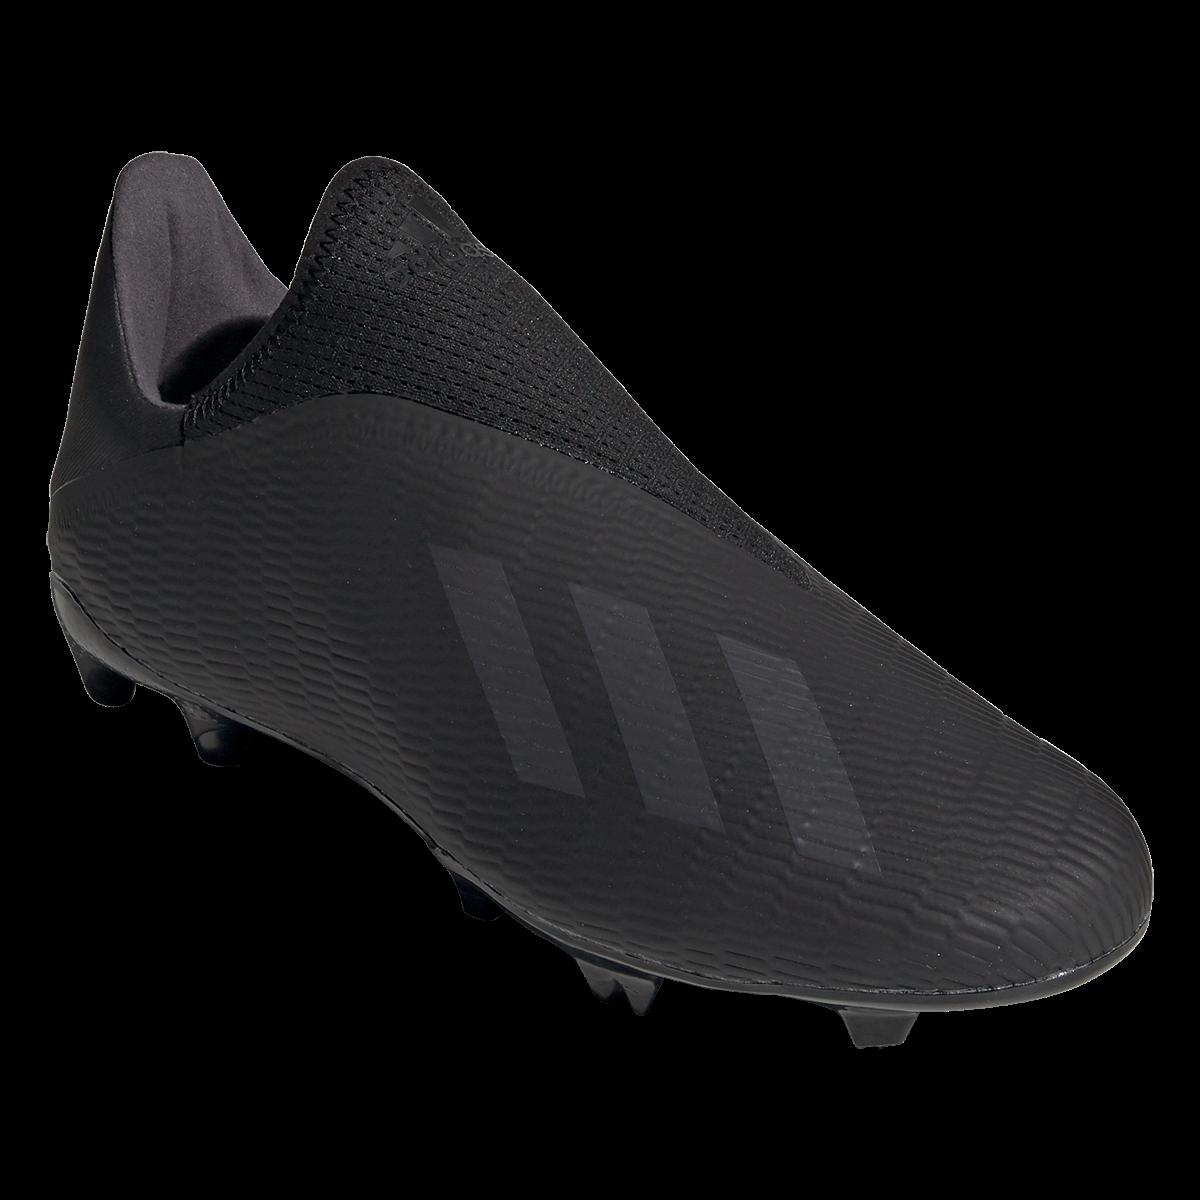 Adidas X 19 3 Laceless Fg Soccer Cleat Black Black Silver 9 In 2020 Cleats Soccer Cleats Adidas Soccer Boots